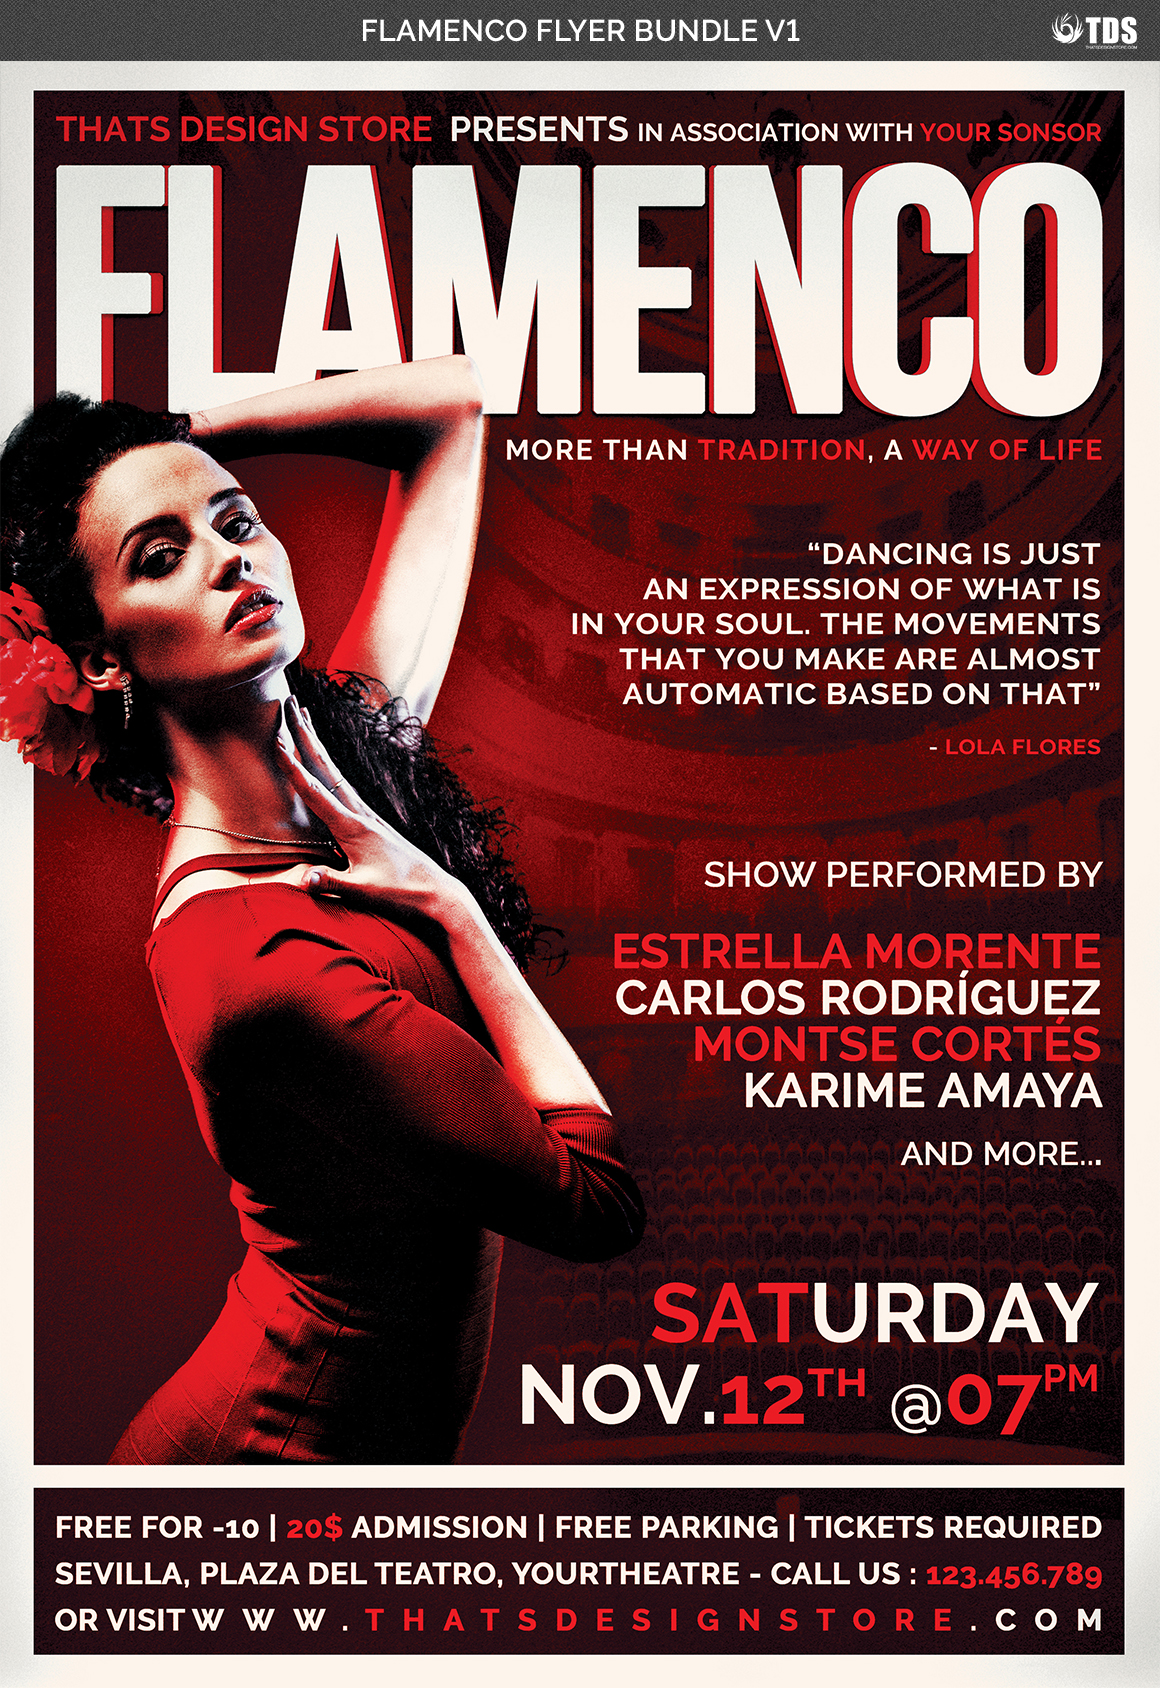 Flamenco Flyer Bundle V1 example image 5